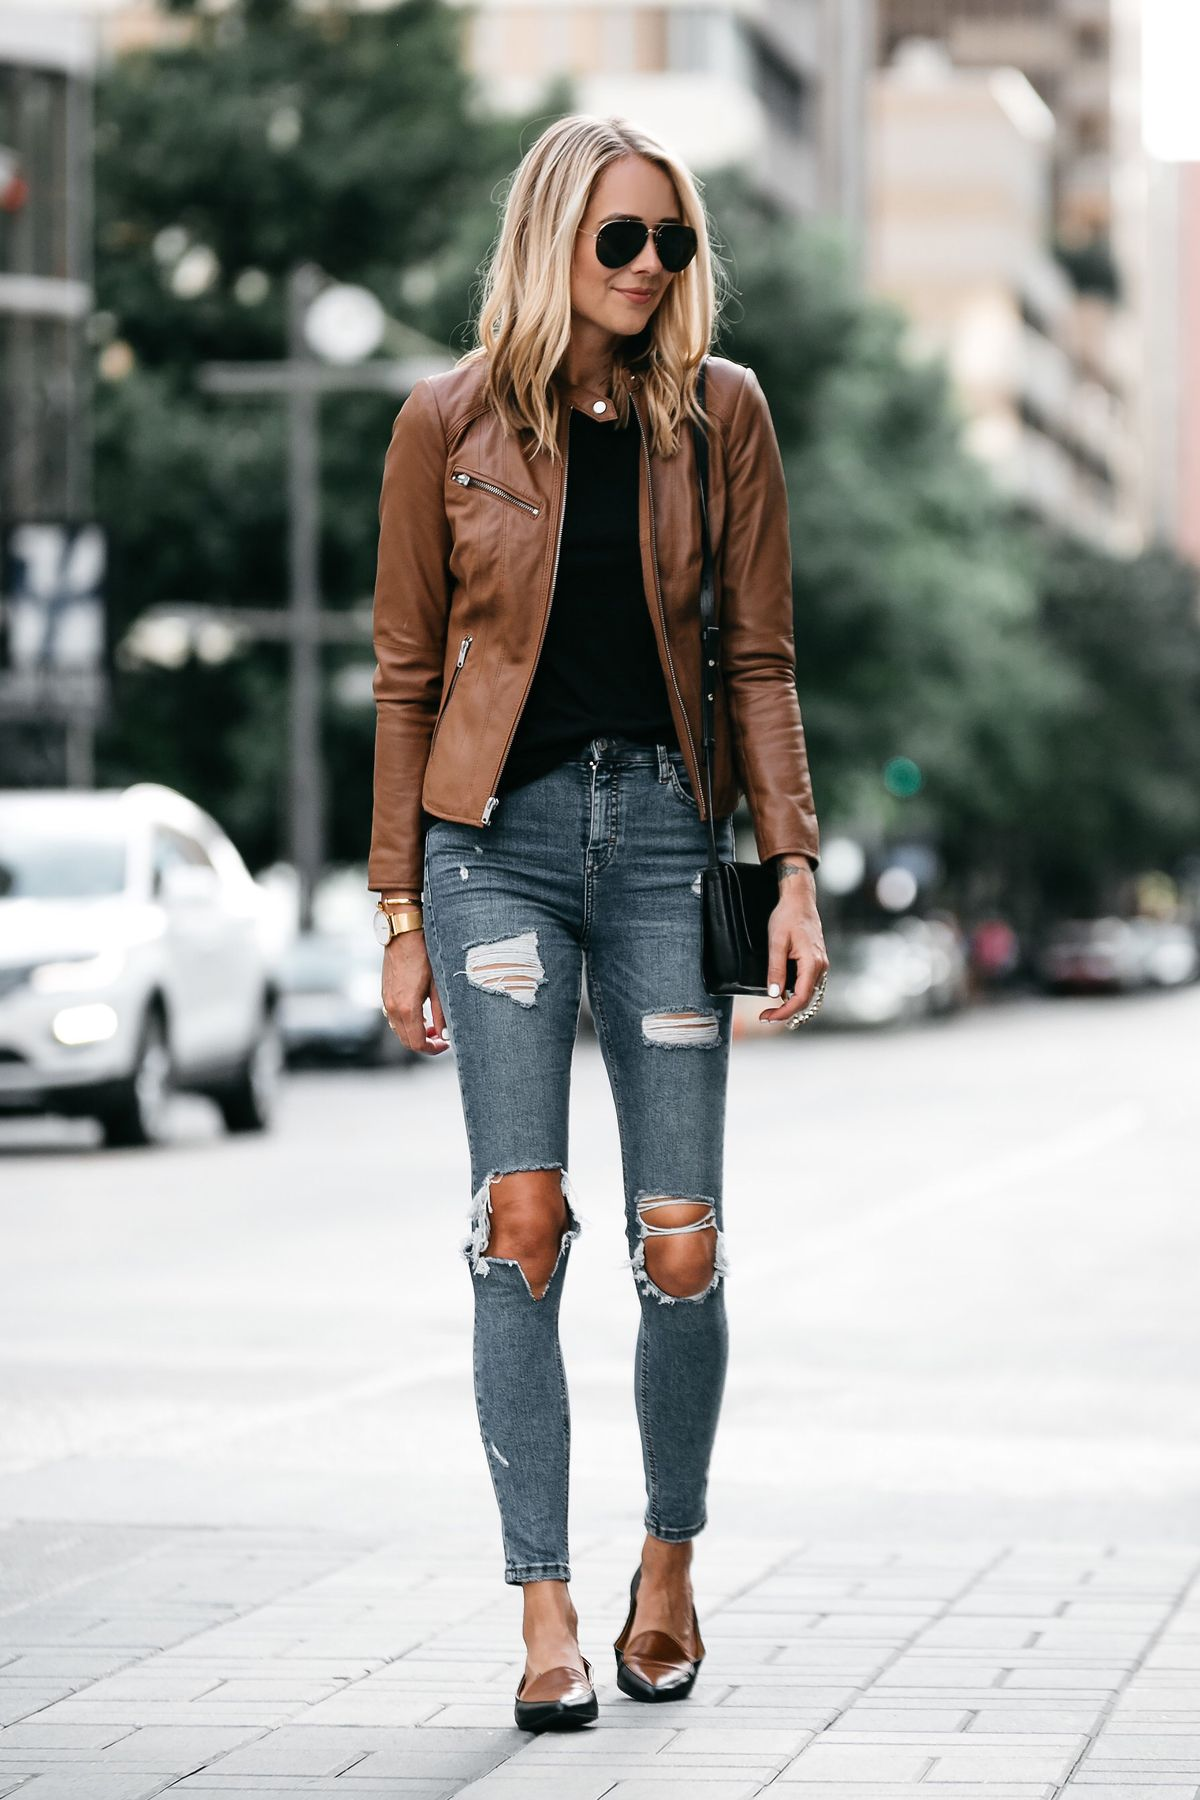 e76ad5f7375 Blonde Woman Wearing Tan Leather Jacket Black Tshirt Denim Ripped Skinny  Jeans Outfit Black Tan Loafers Chloe Faye Handbag Fashion Jackson Dallas  Blogger ...